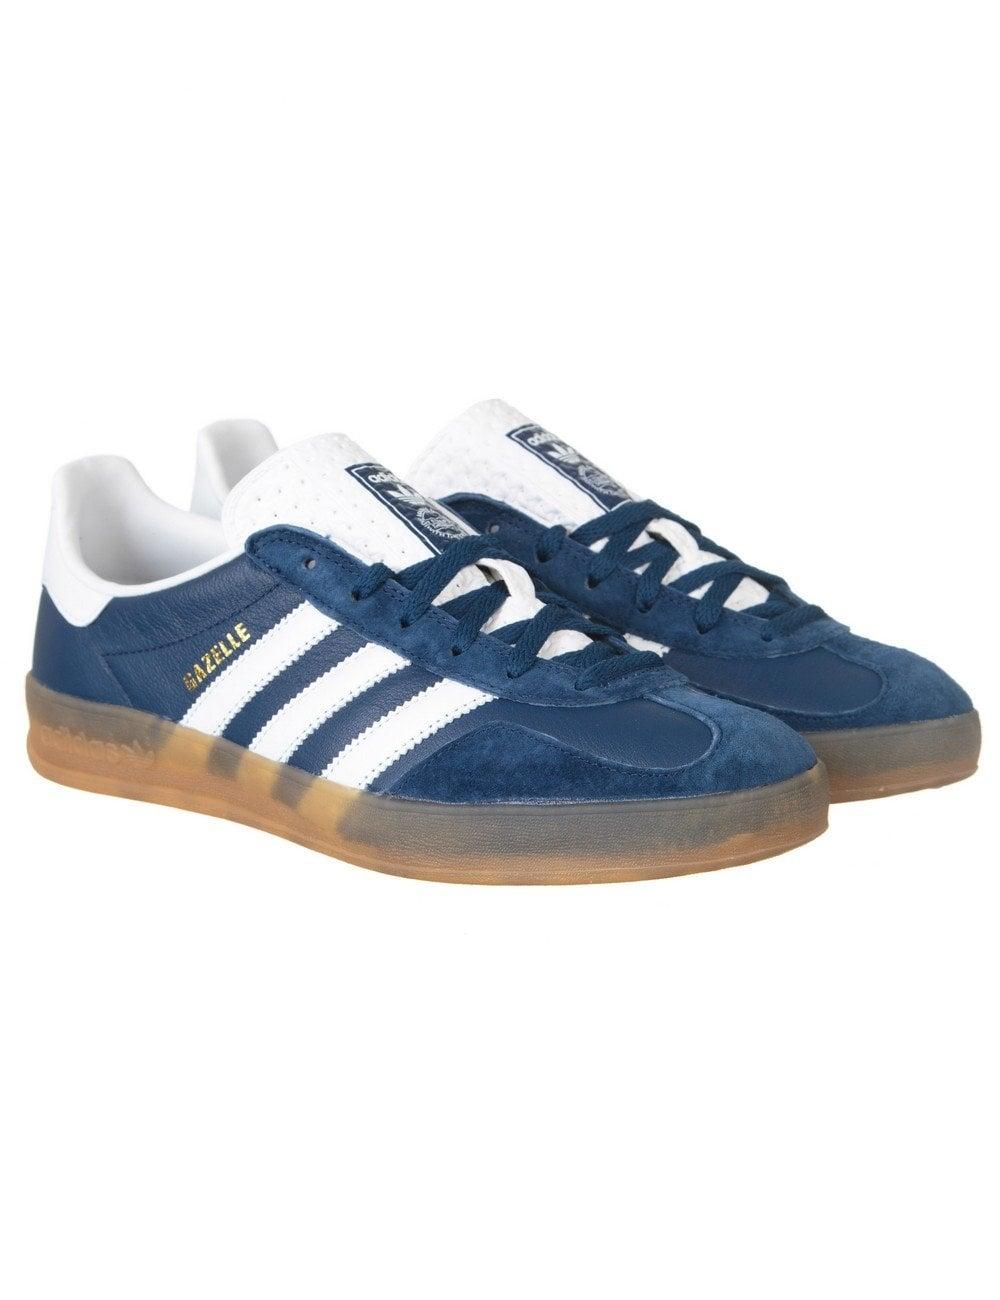 reputable site 5dde2 fcb44 Adidas Originals Gazelle Indoor Shoes - Oxford Blue